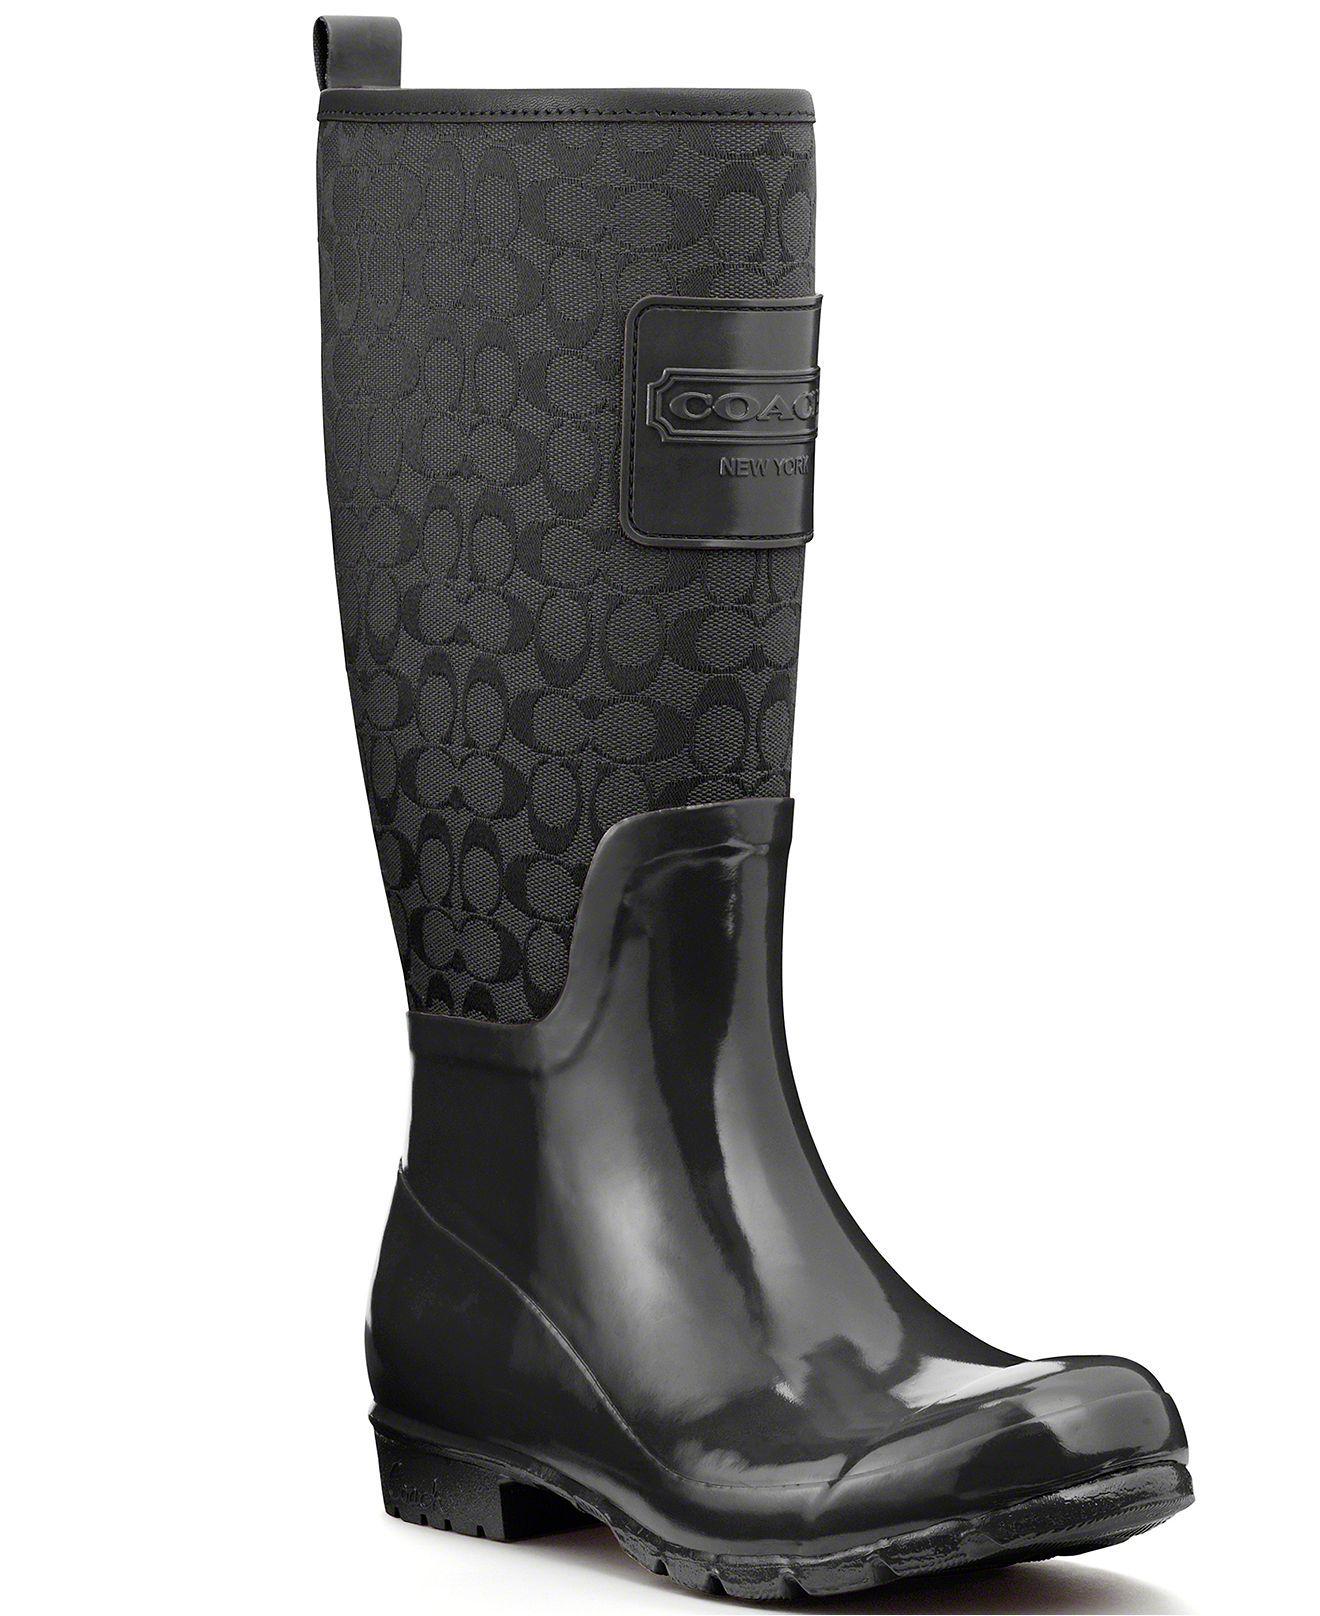 Womens Boots COACH Pearla Black/Black